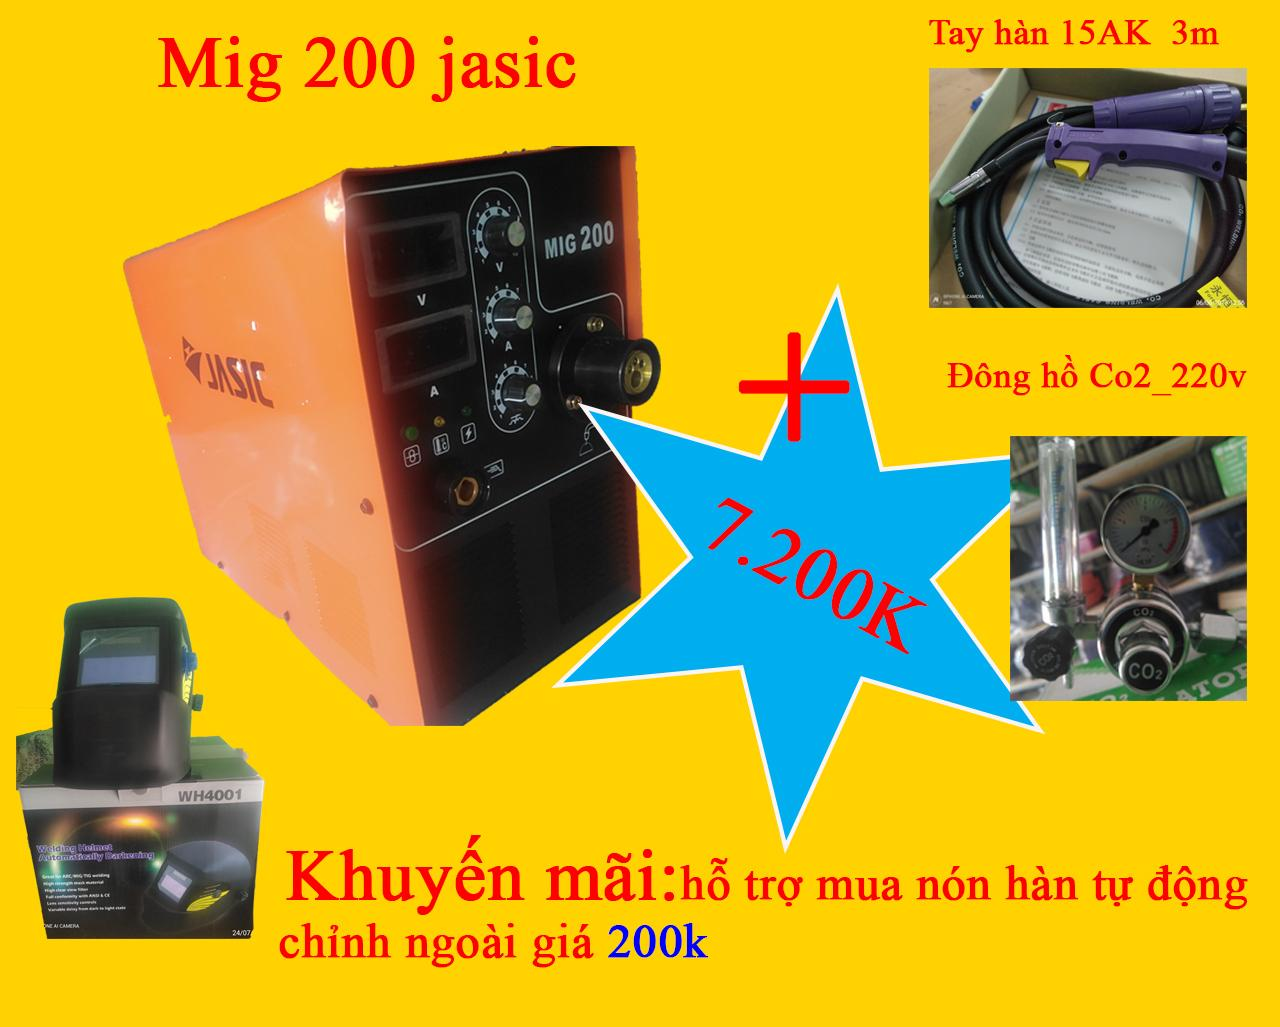 Hàn Mig 200-jasic